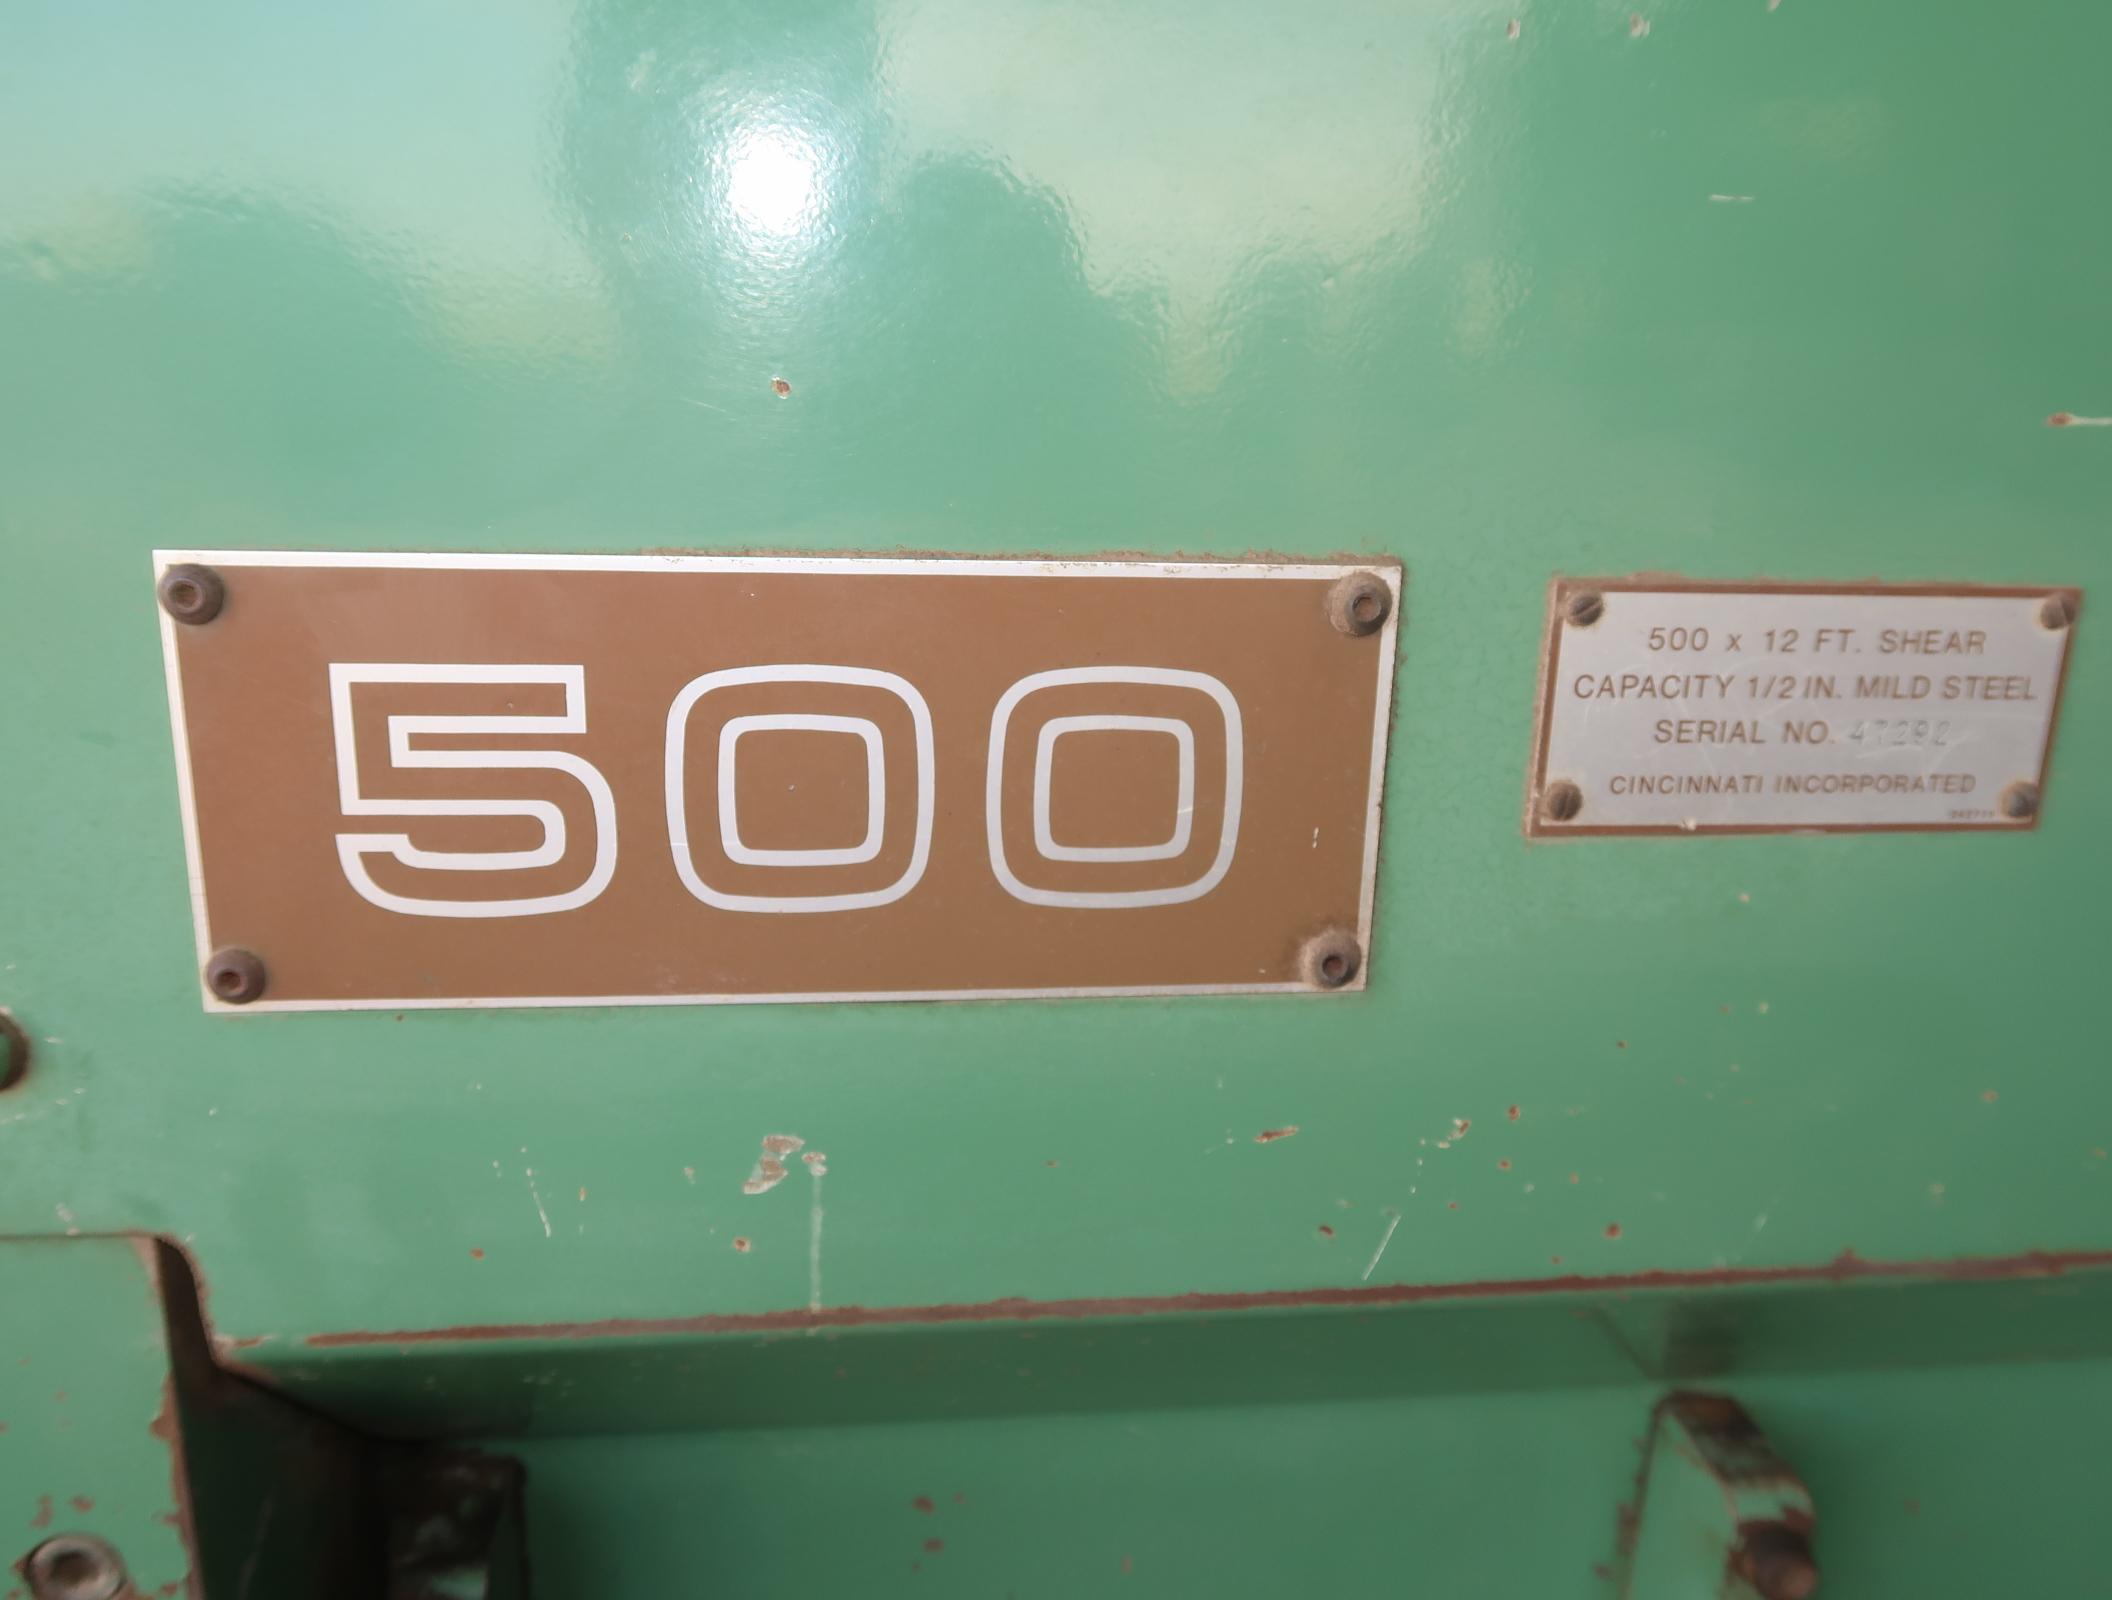 "CINCINNATI 500TON X 12' SHEAR, F.O.P.B.G., 1/2"" MILD STEEL, SN. 47292 (THIS SHEAR IS LOCATED AT - Image 3 of 6"